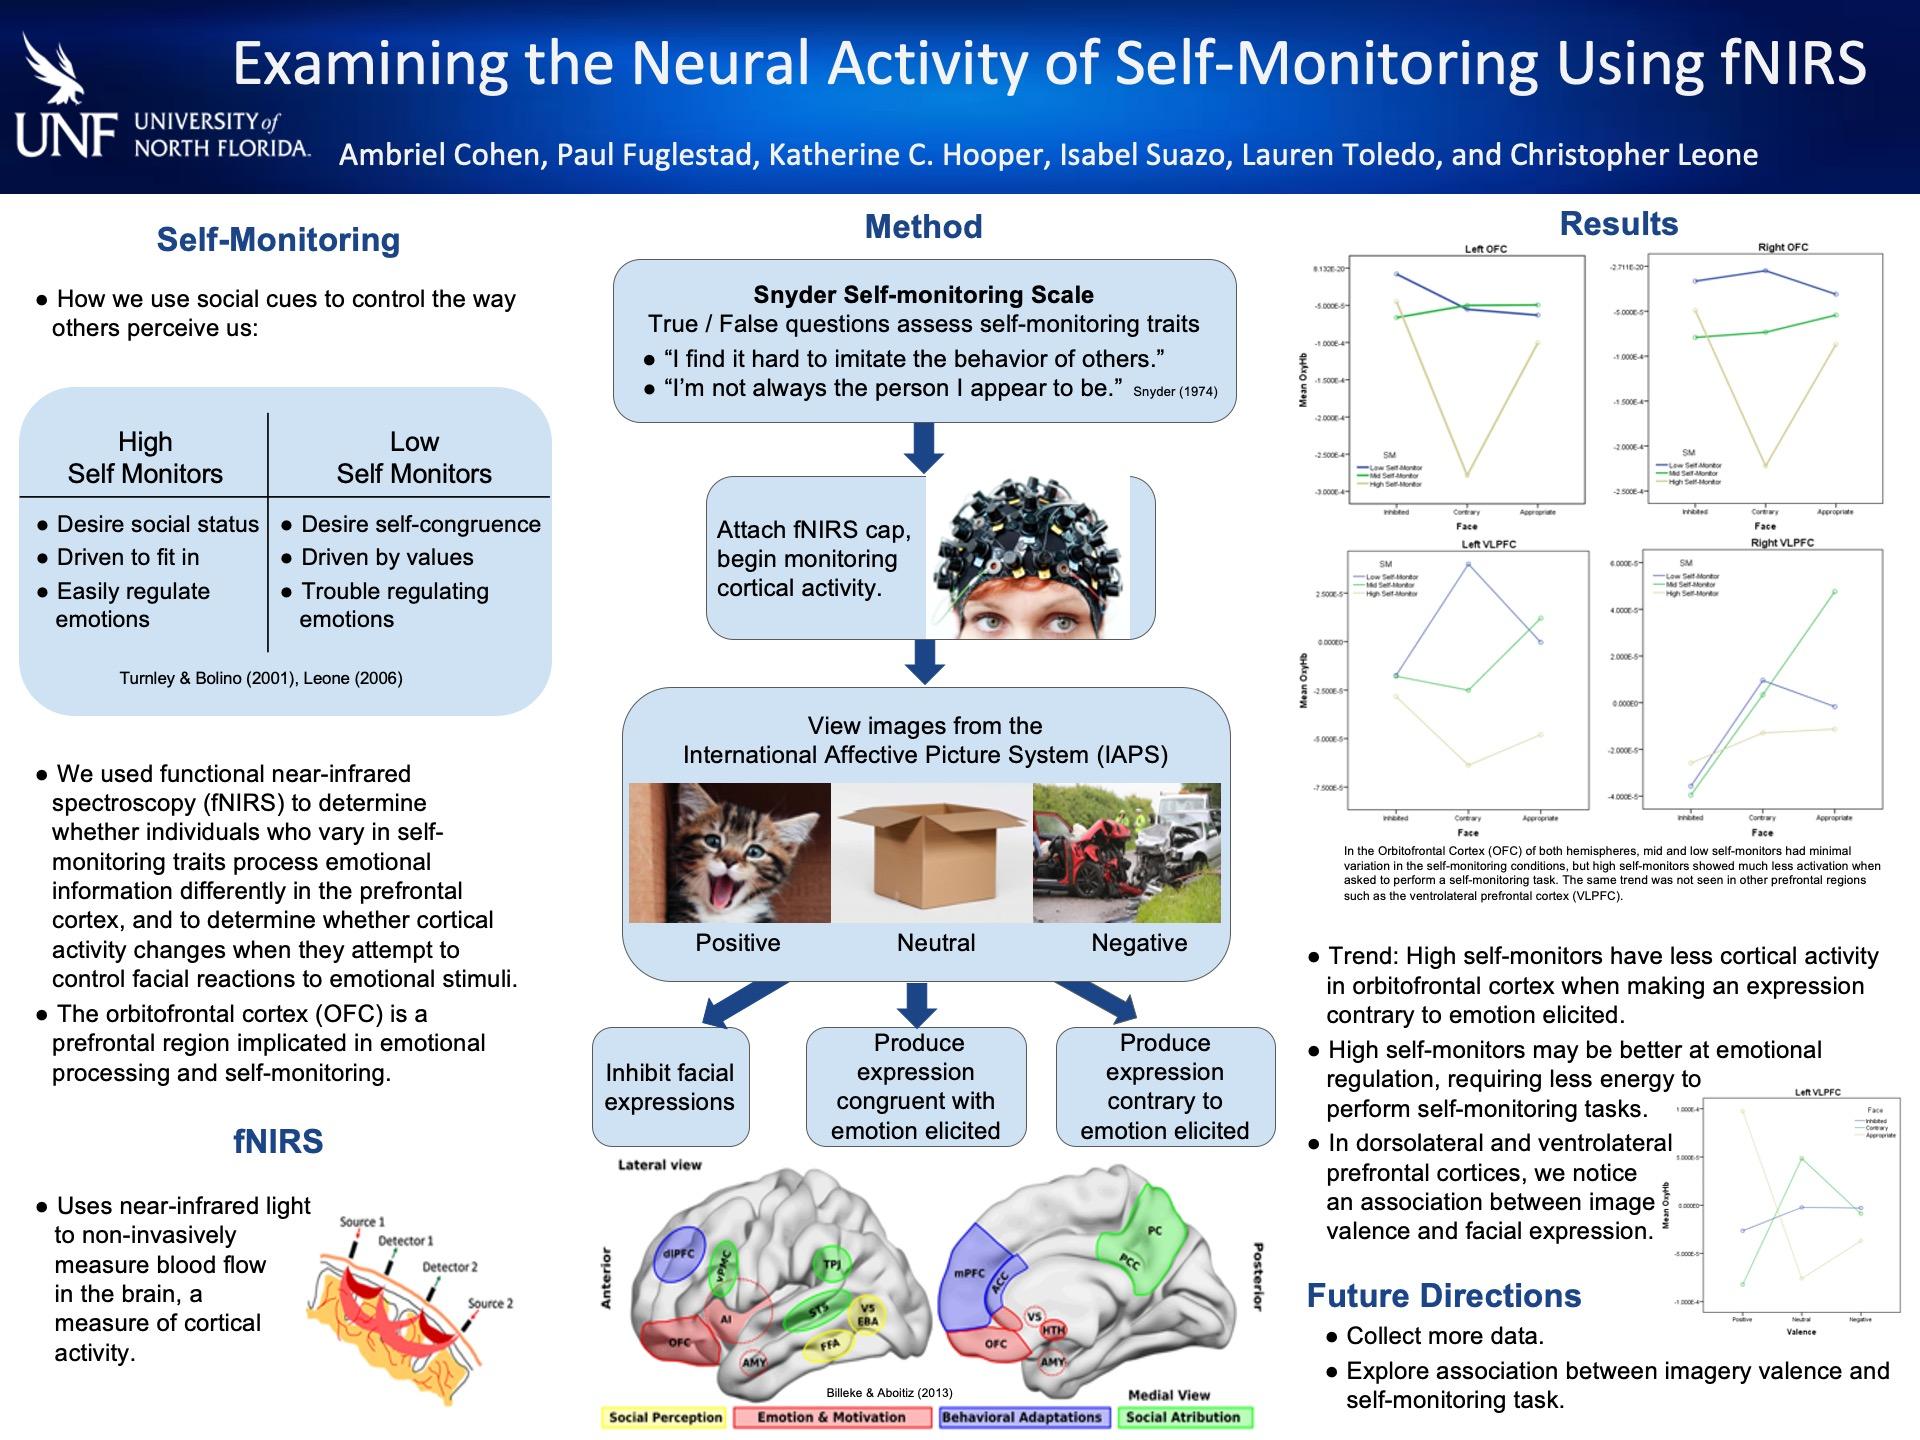 Examining the Neural Activity of Self-Monitoring Using fNIRS poster